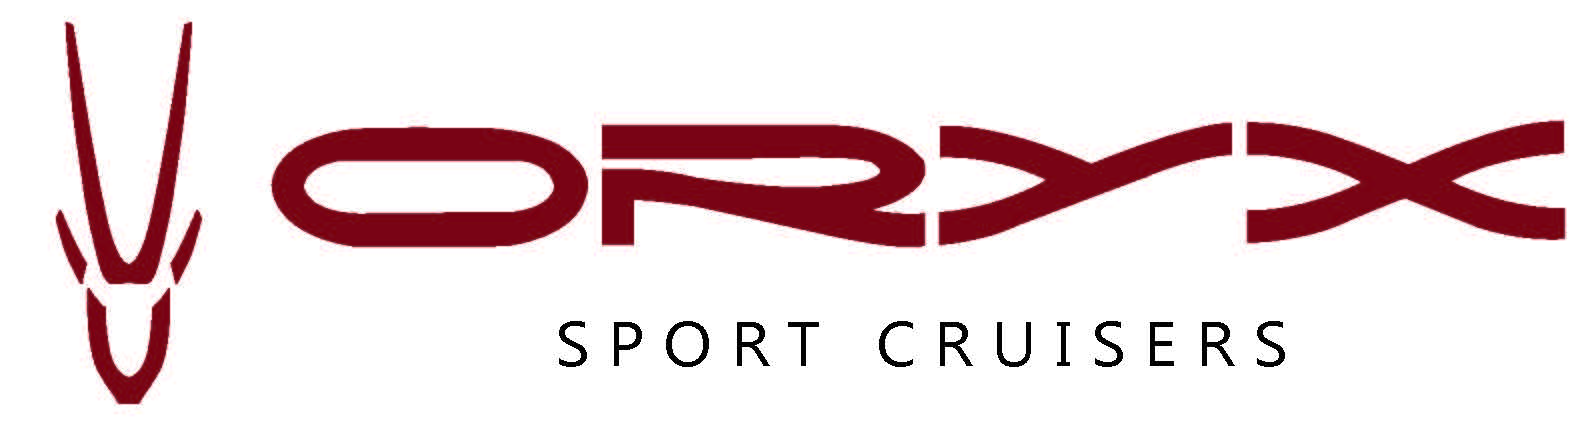 Oryx Sport Cruisers brand logo 2019